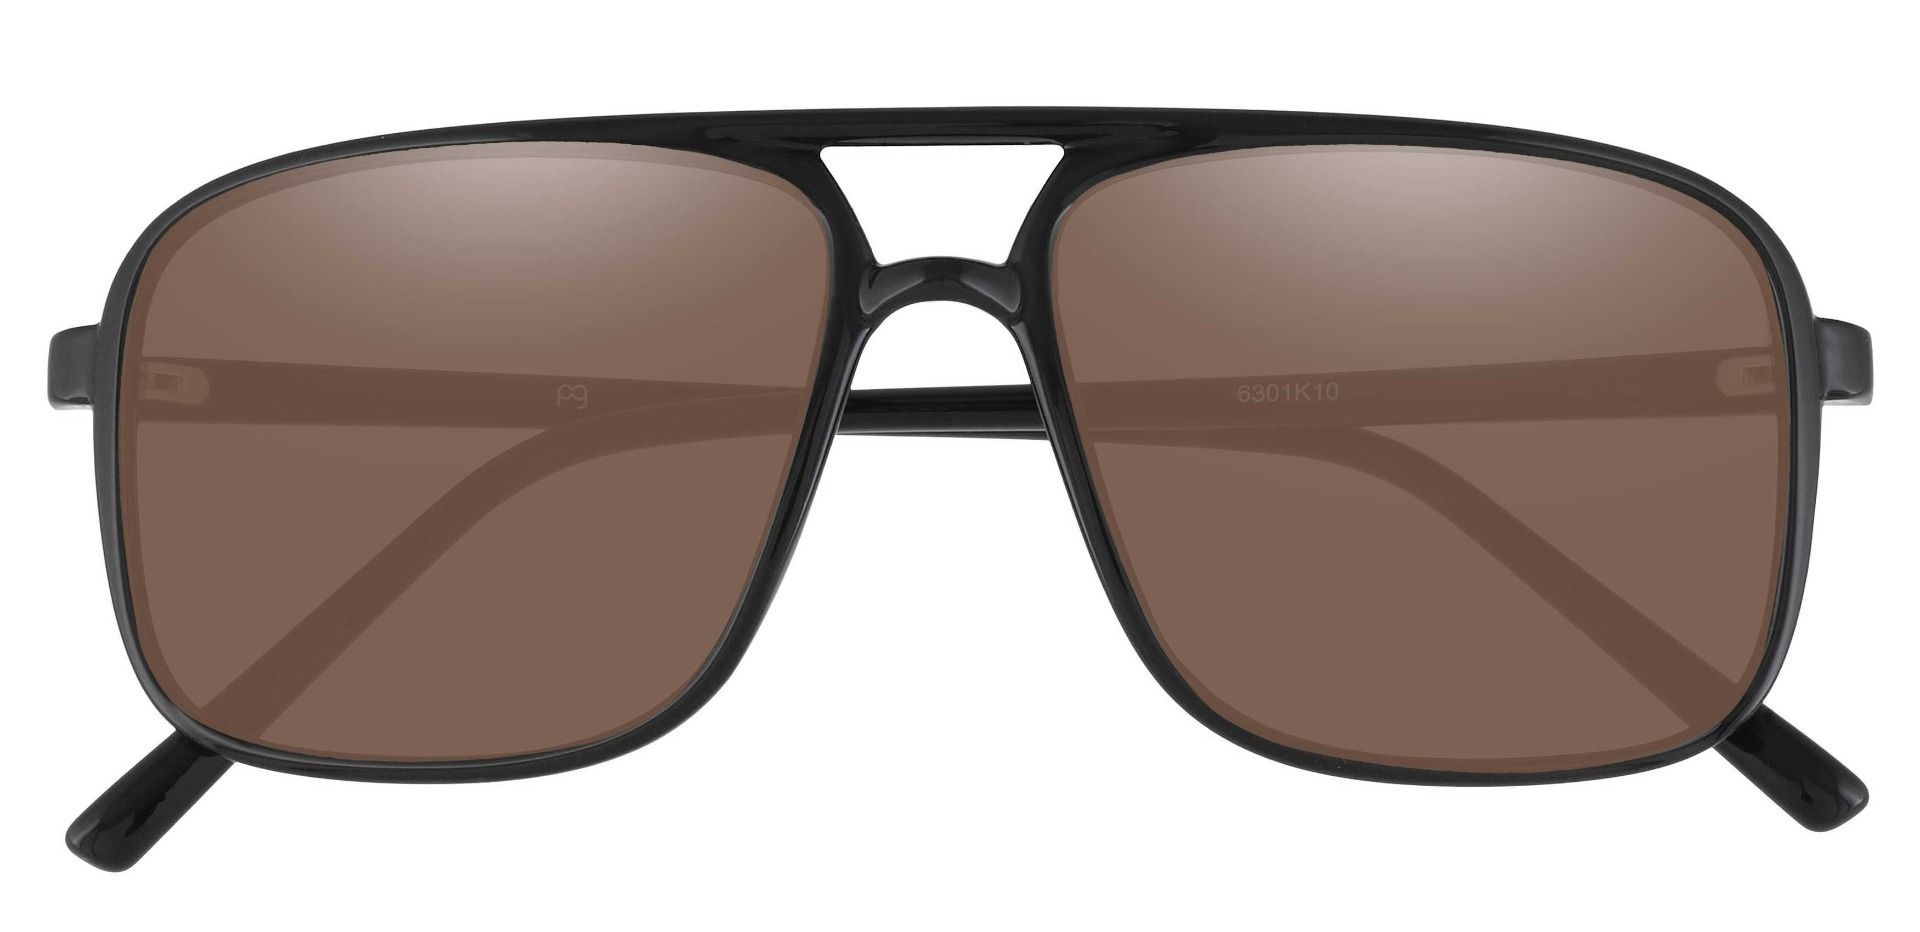 Atwood Aviator Prescription Sunglasses - Black Frame With Brown Lenses